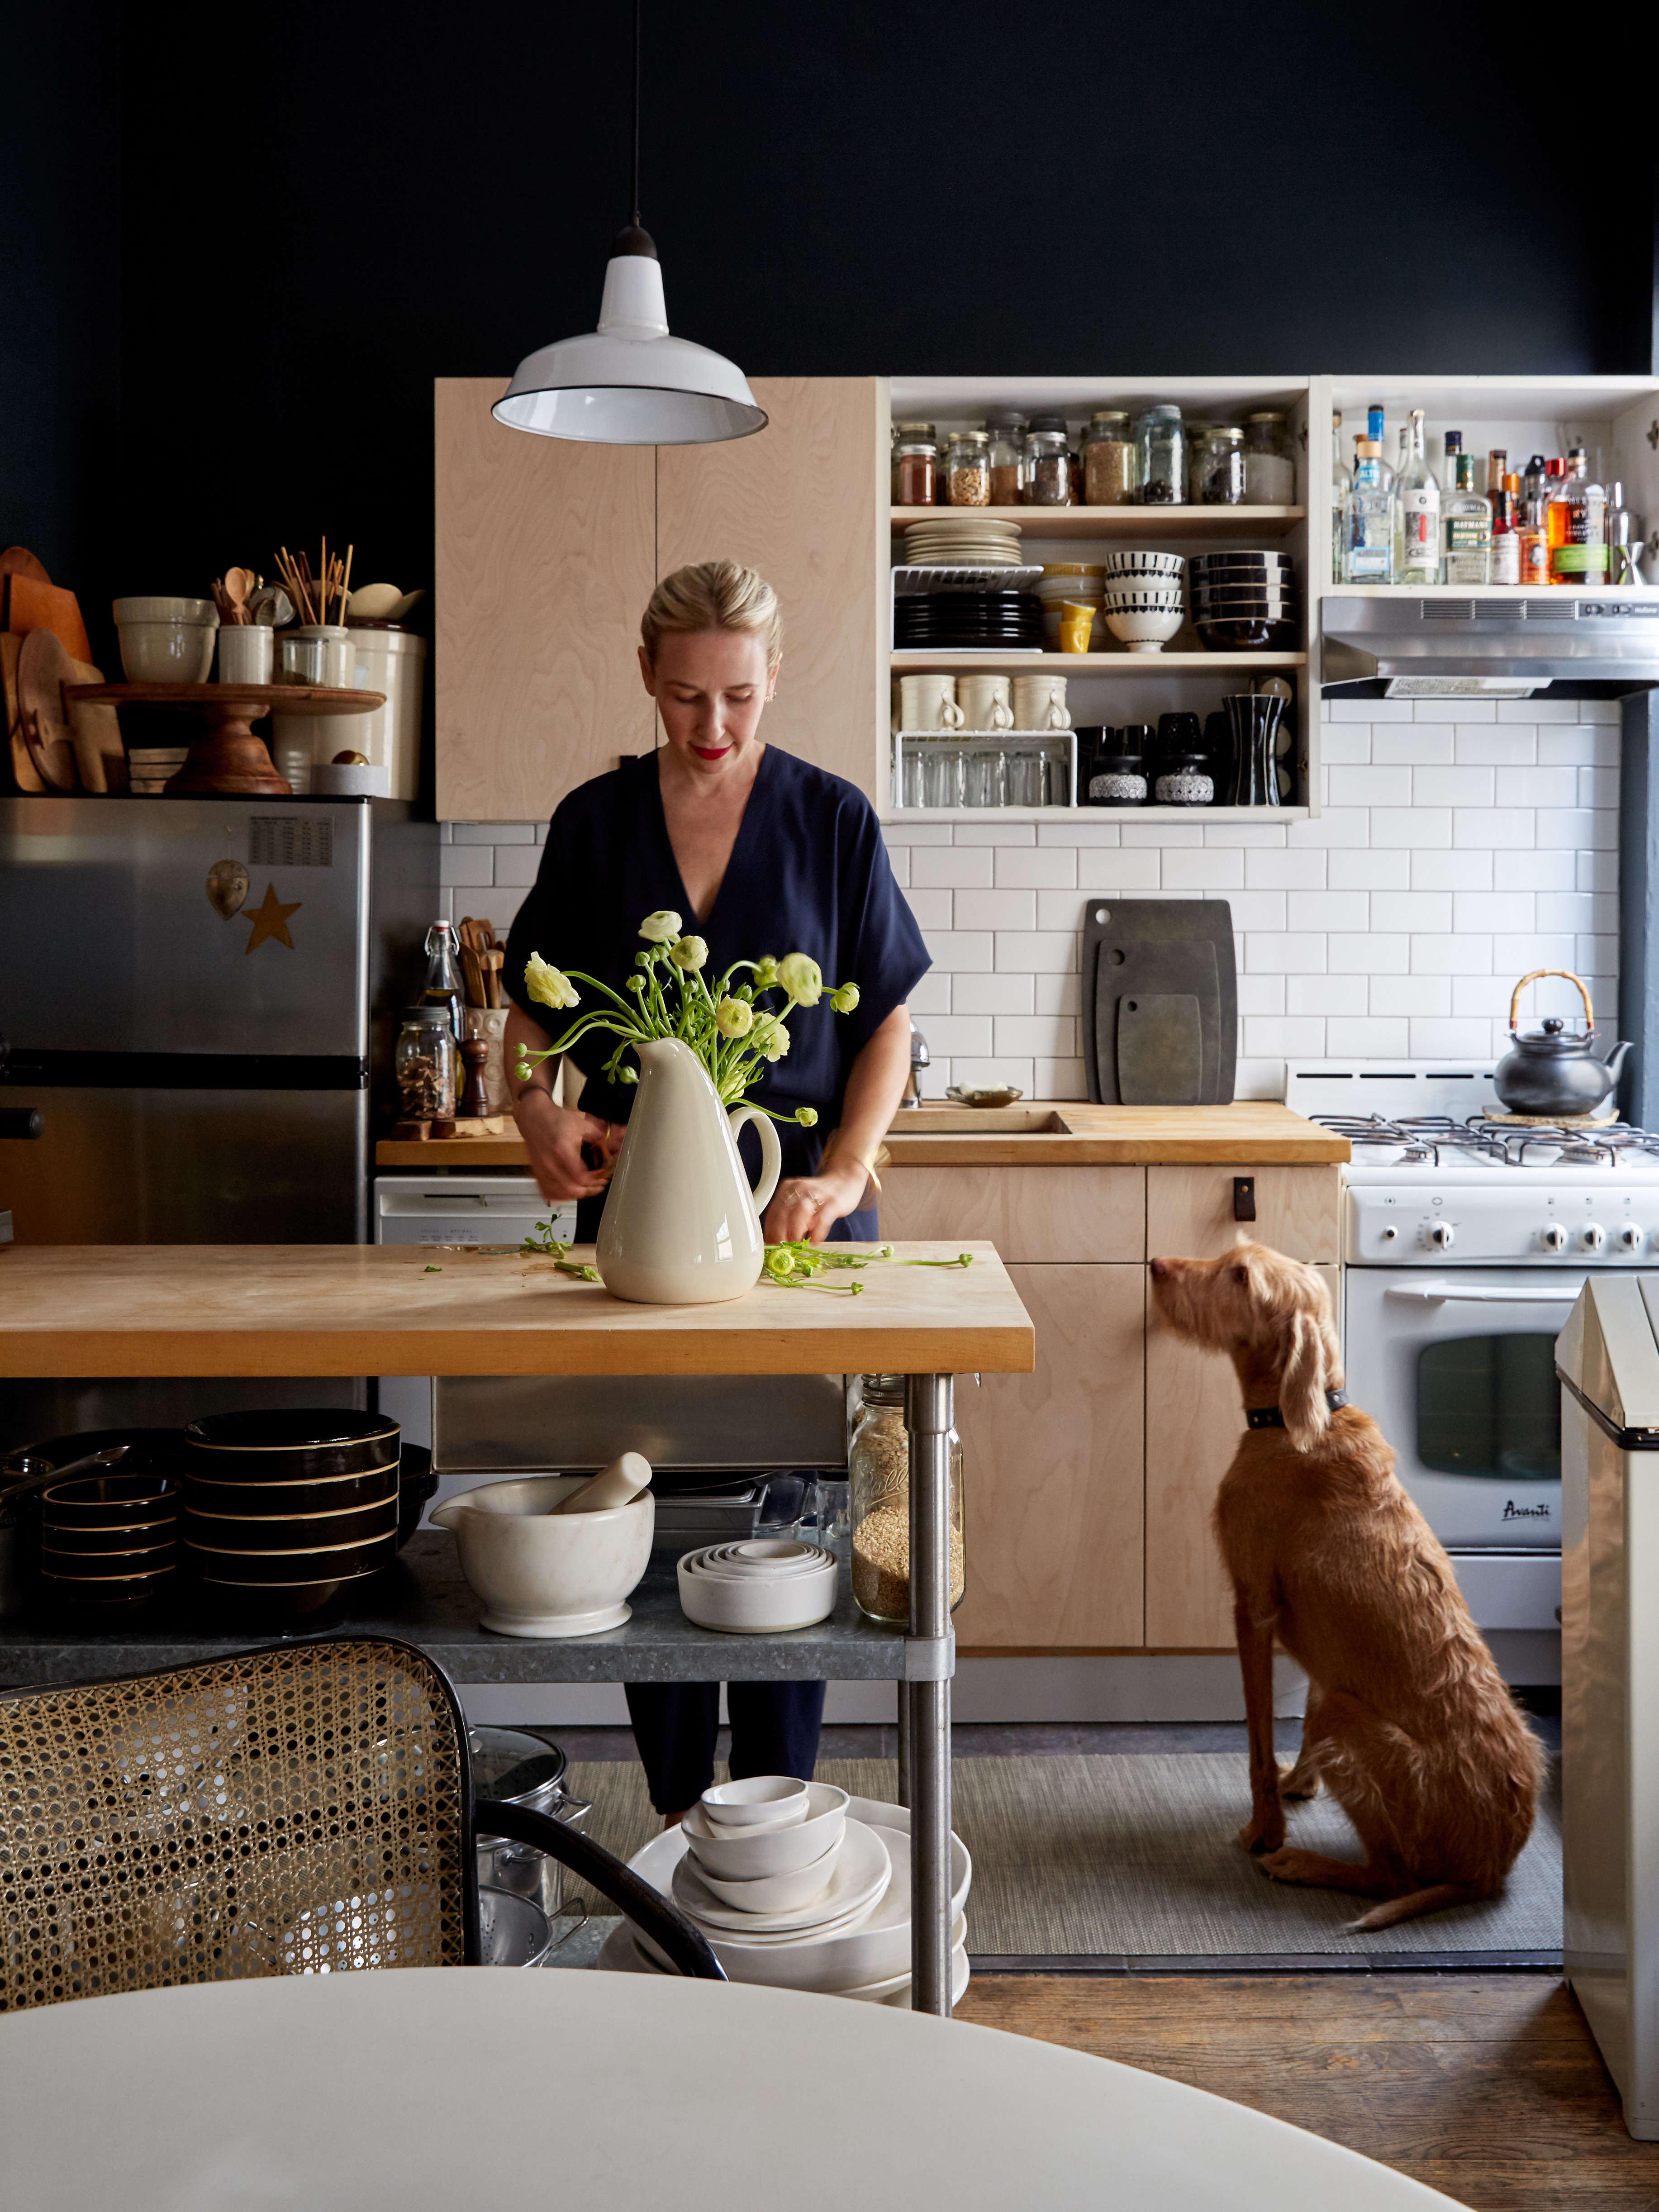 Renata Bokalo at home in her DIY kitchen remodel in her rental apartment